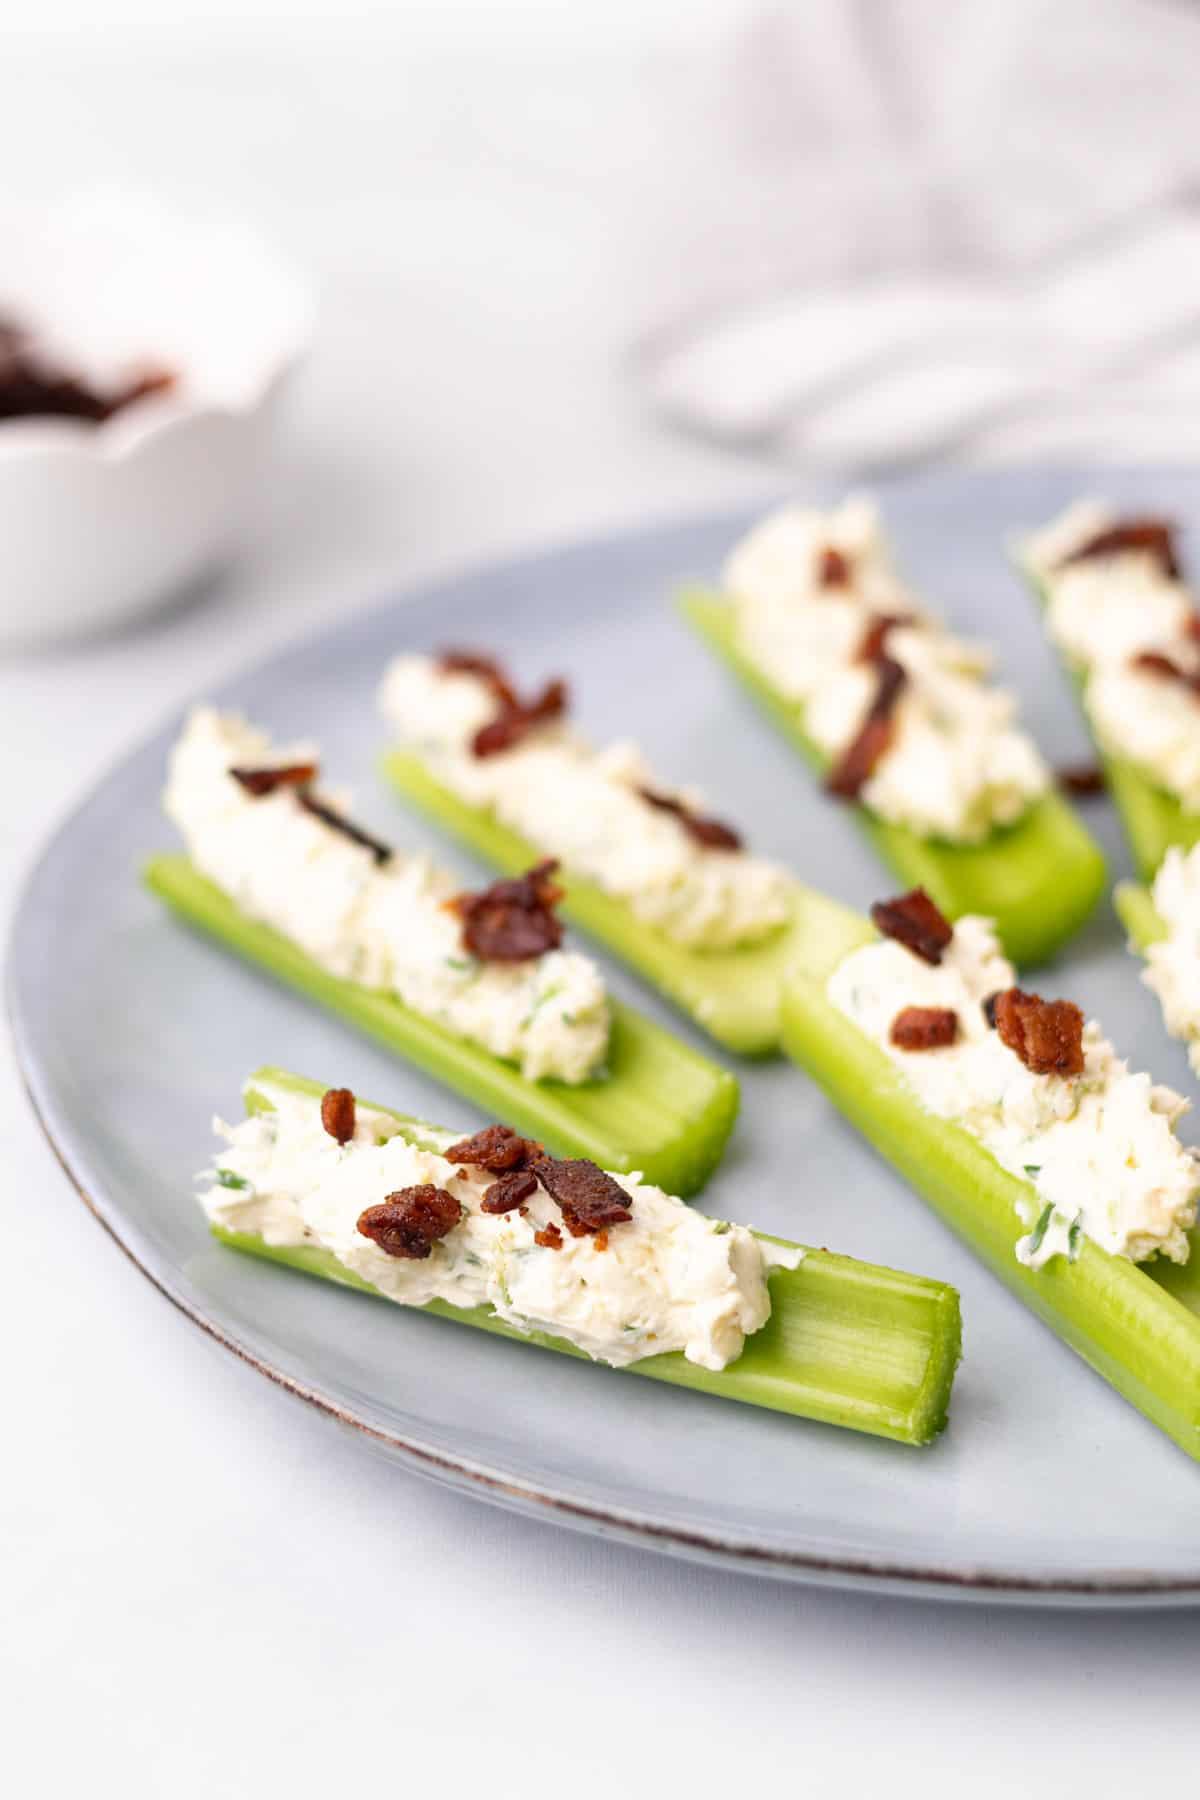 6 stuffed celery stalks on a plate